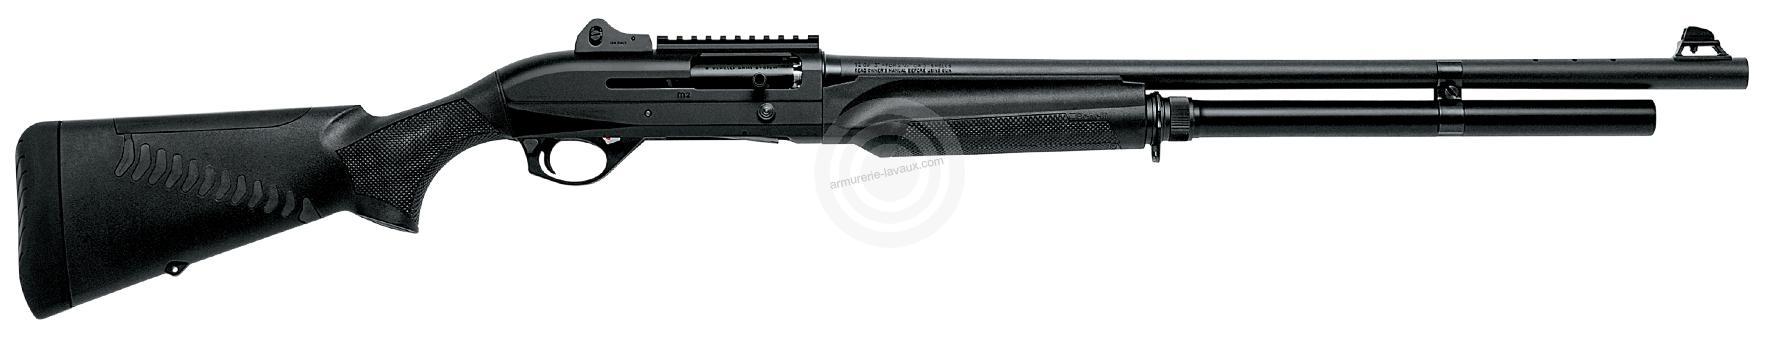 Fusil IPSC semi-automatique BENELLI M2 Practical Comfortech cal.12/76